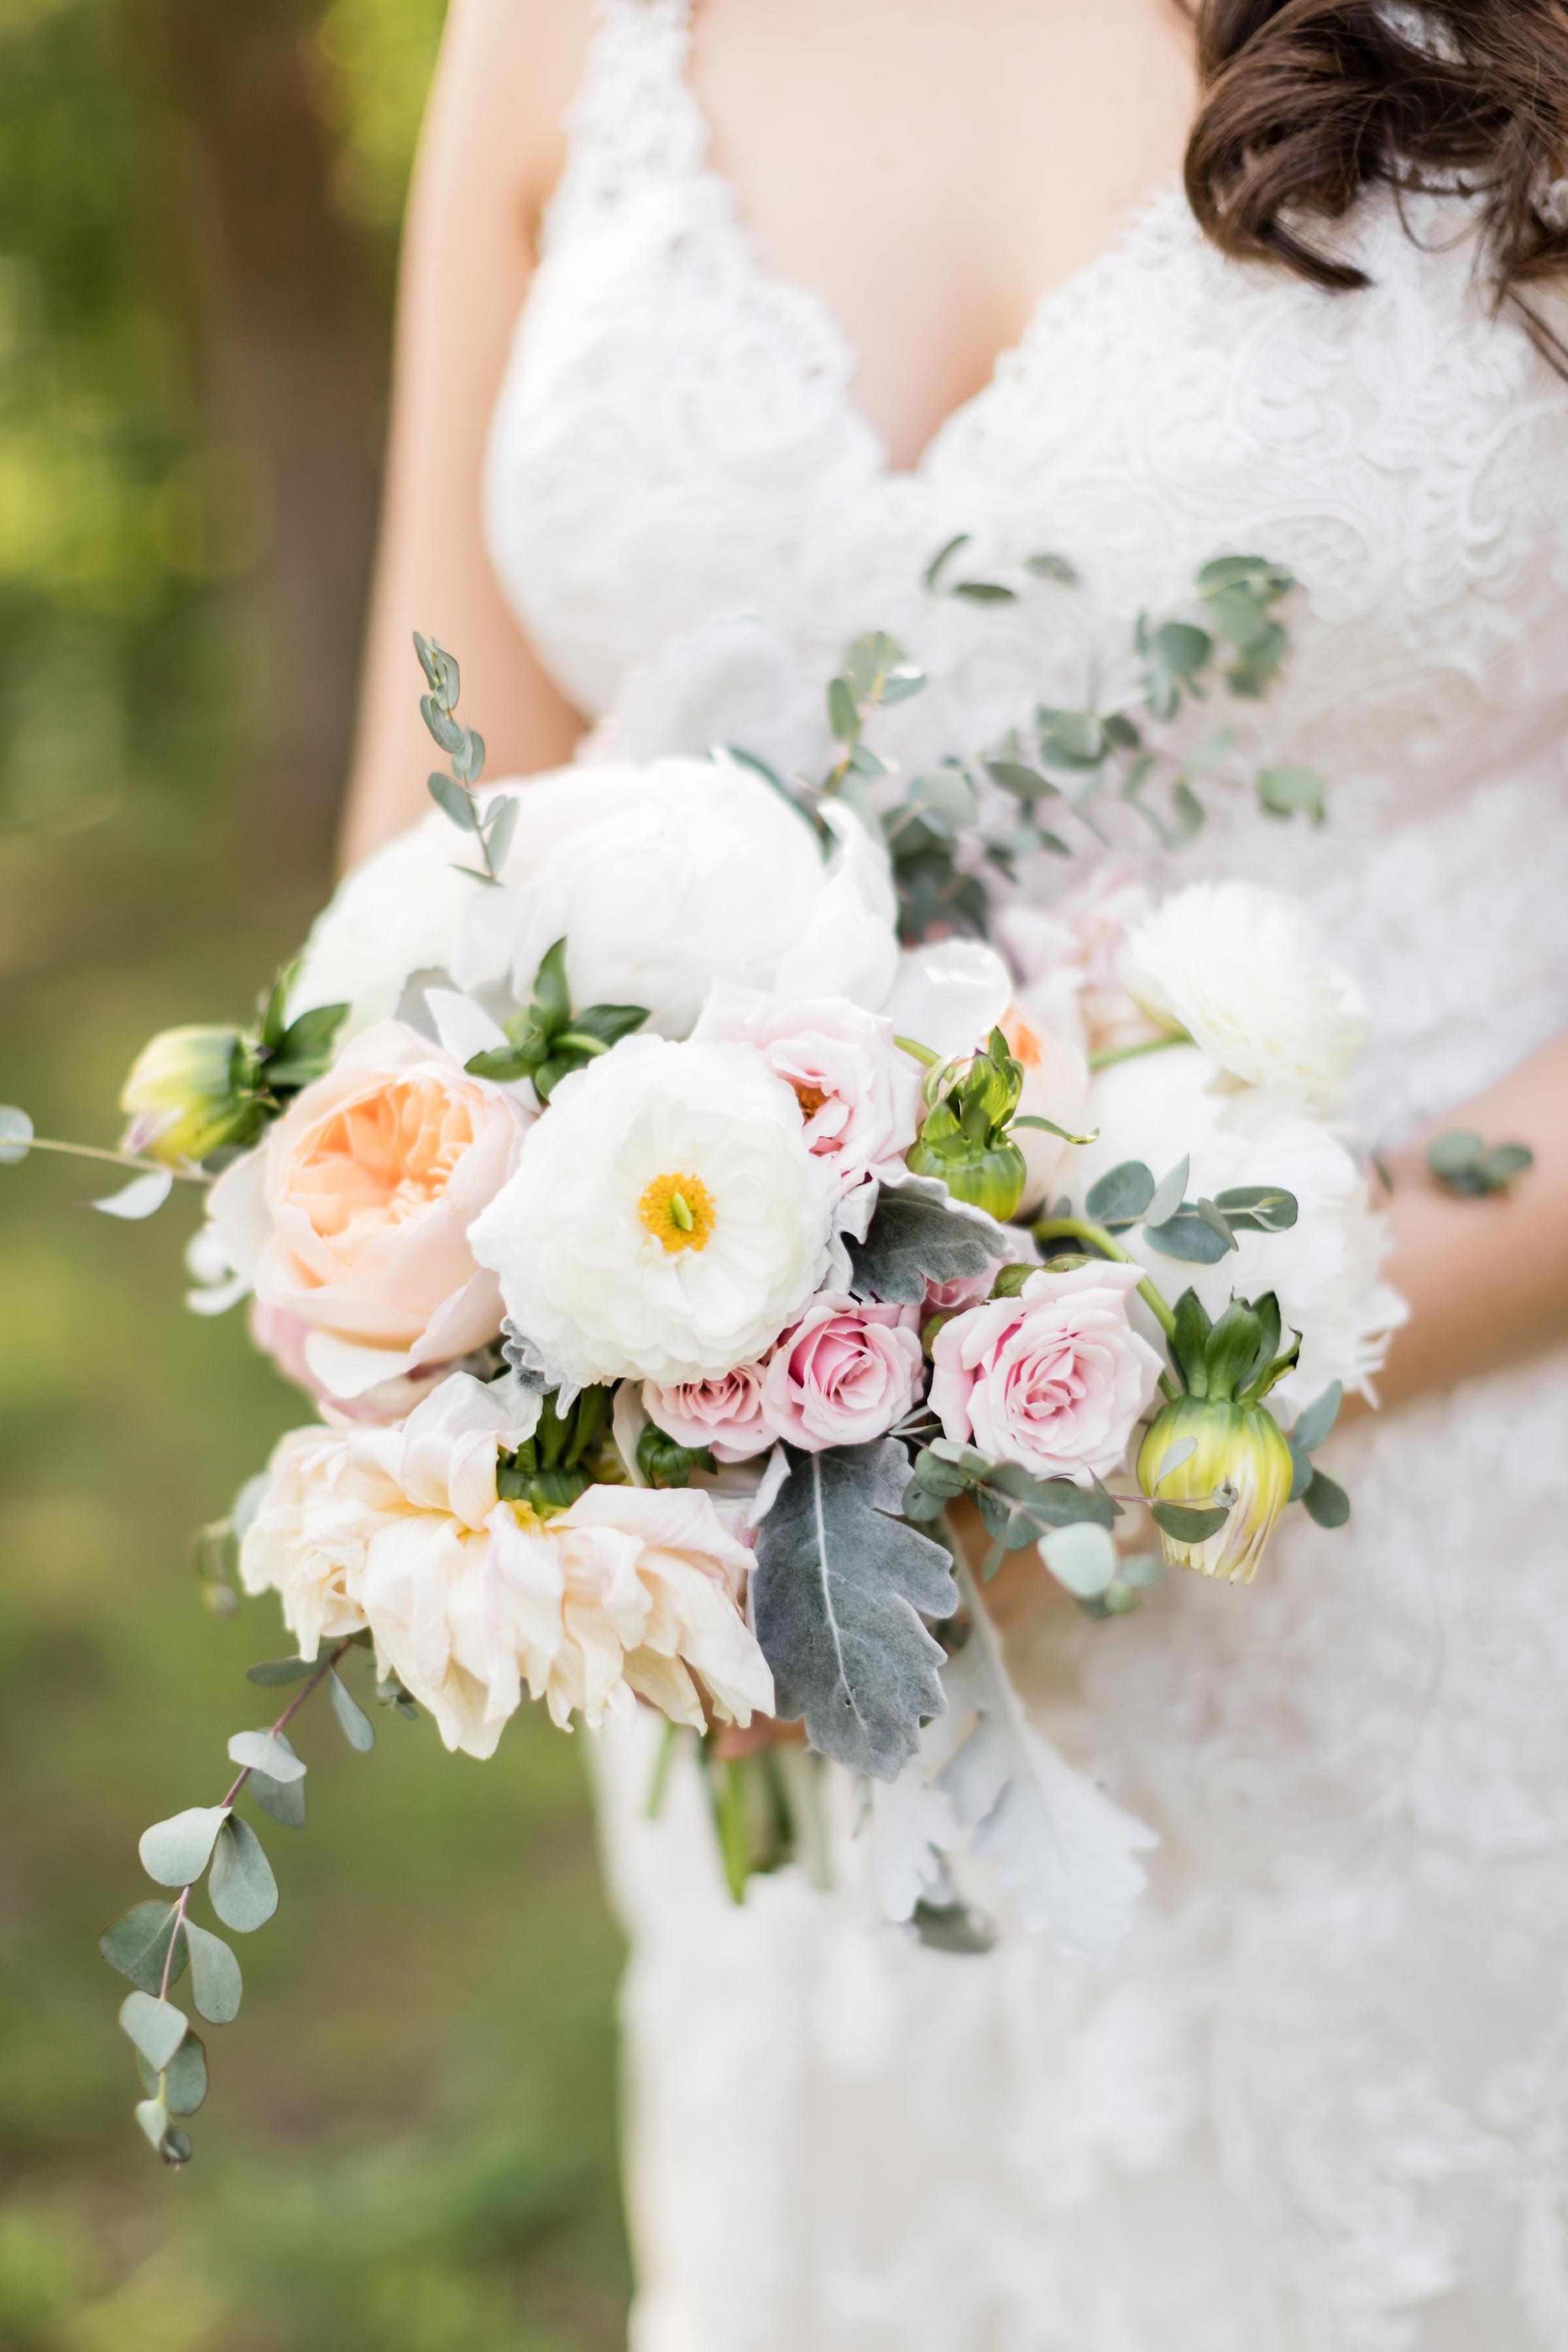 brielle-davis-events-kairos-photography-chandler-hill-wedding-bridal-boquet.jpg